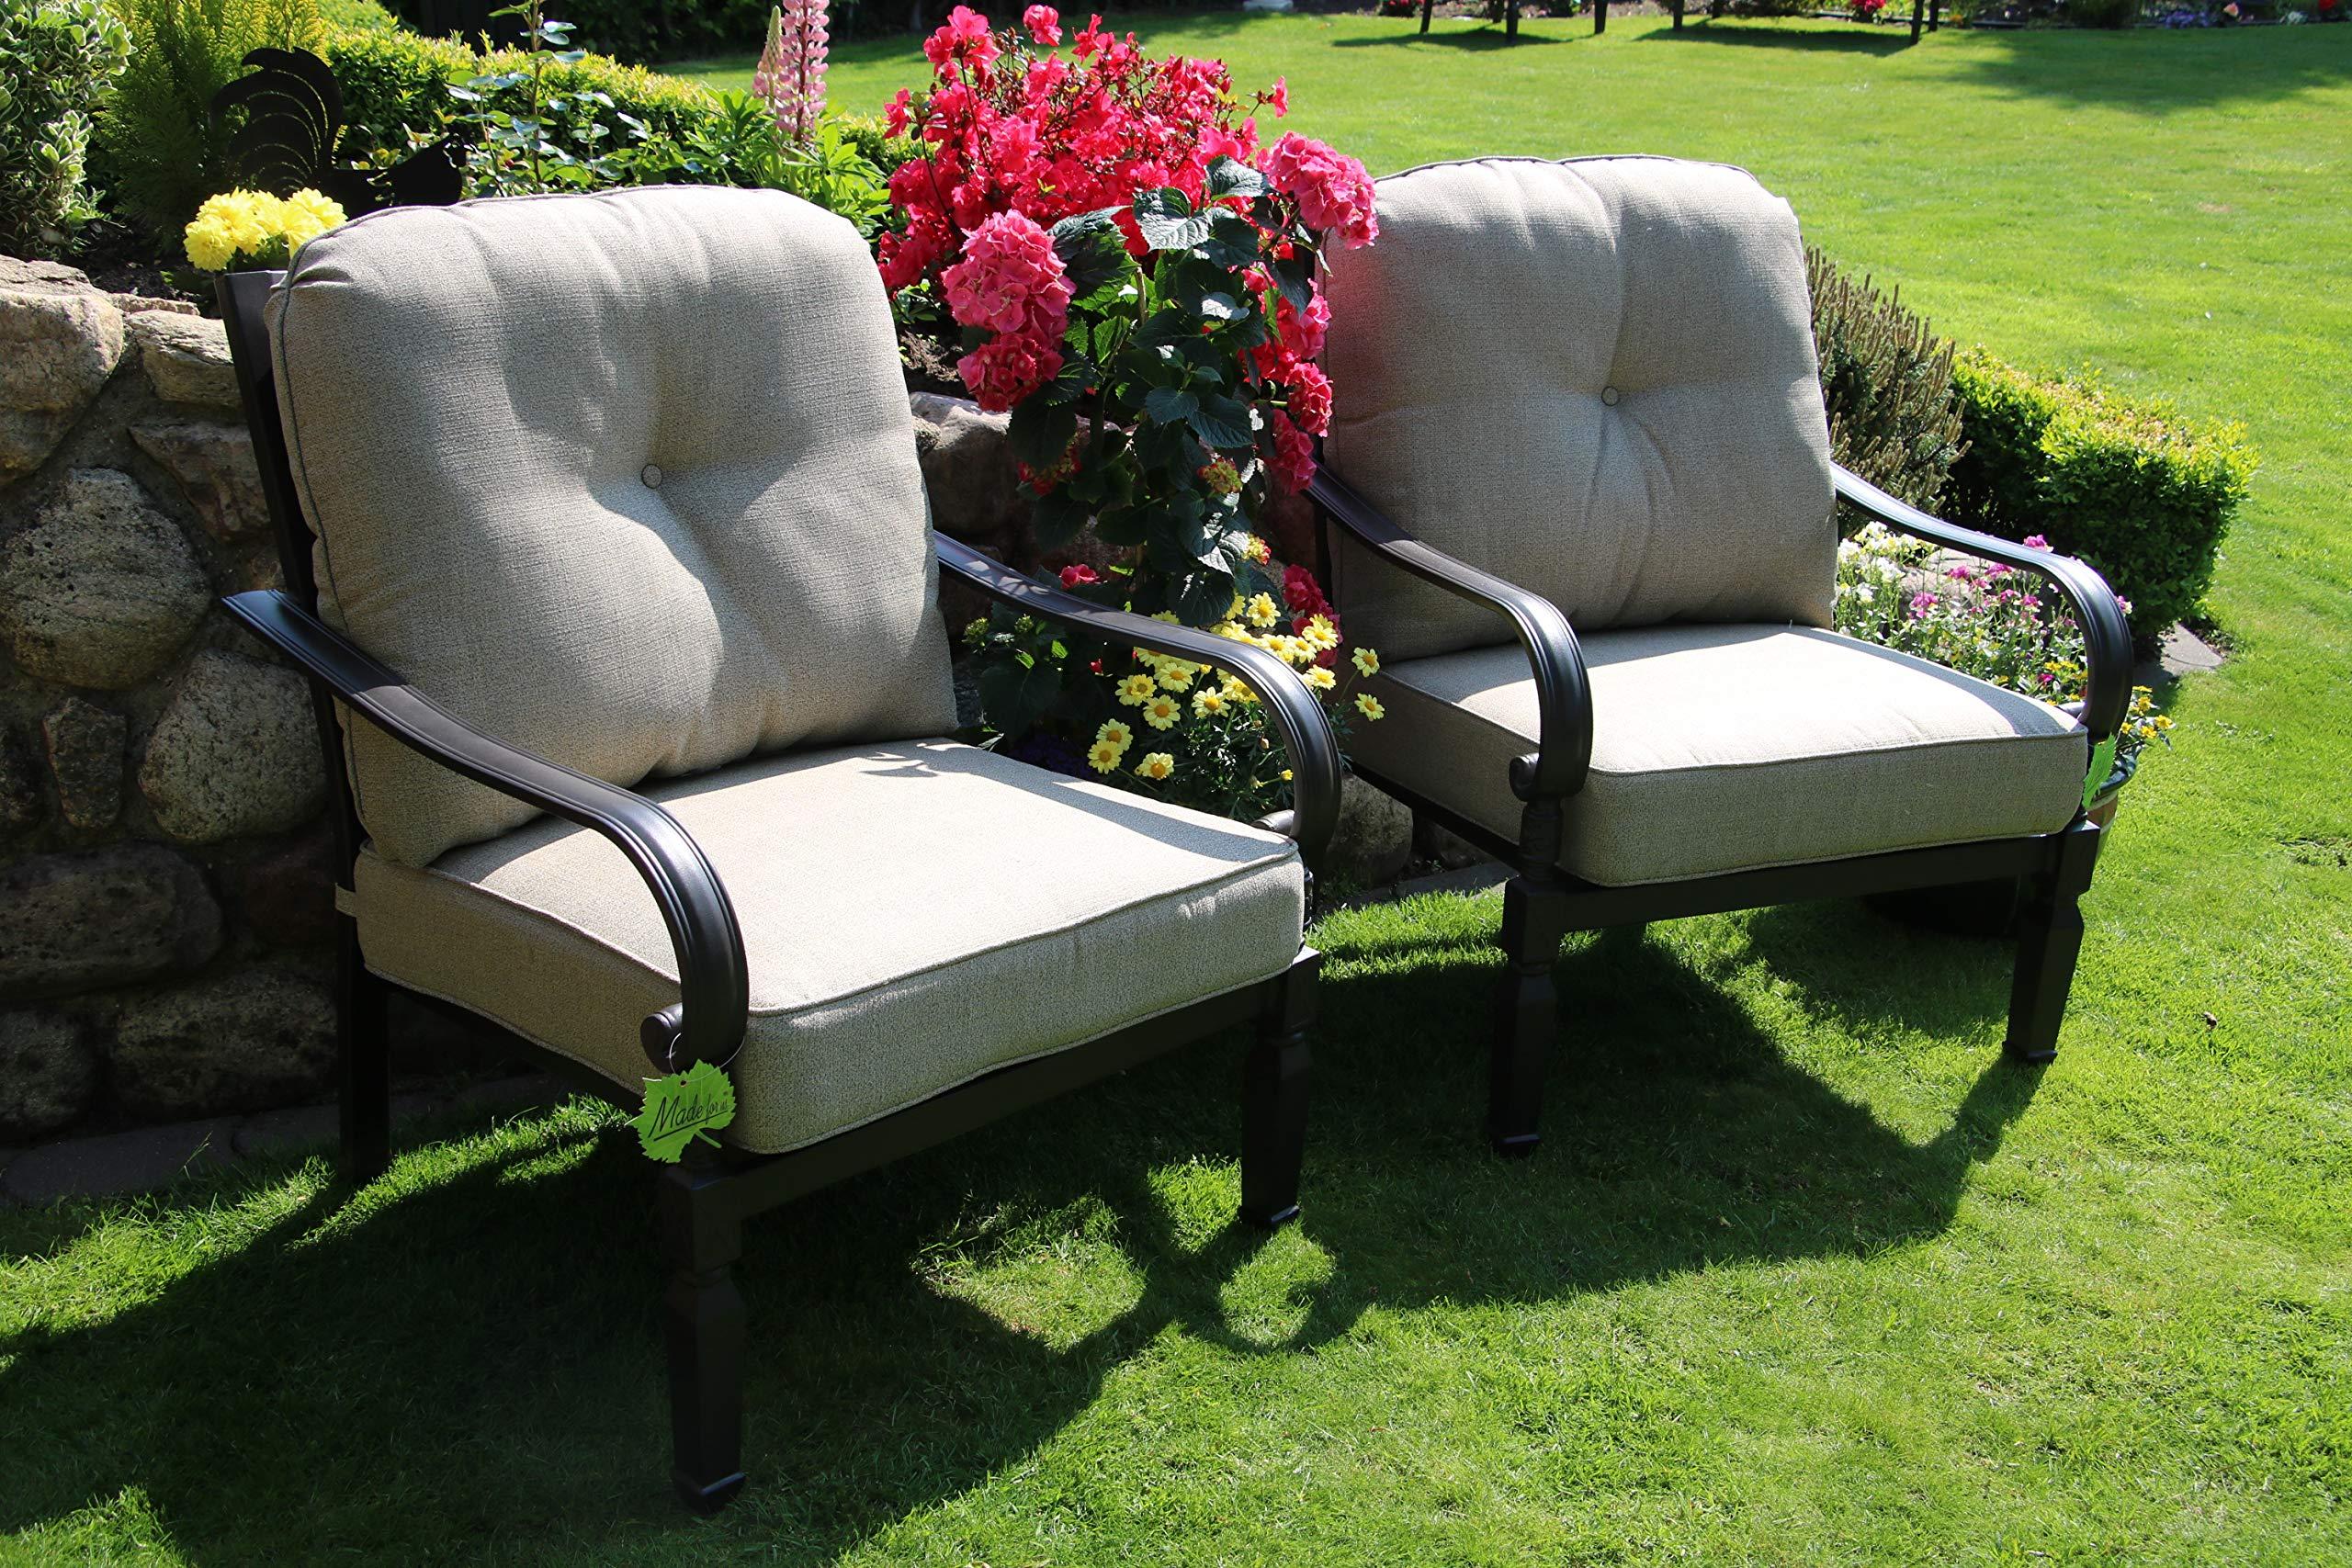 Hanseatisches Im- & Export Contor GmbH Aluminio Fundido Jardín Sillón Set, Muebles de jardín Muebles de jardín, Exterior Sillón (: Amazon.es: Jardín